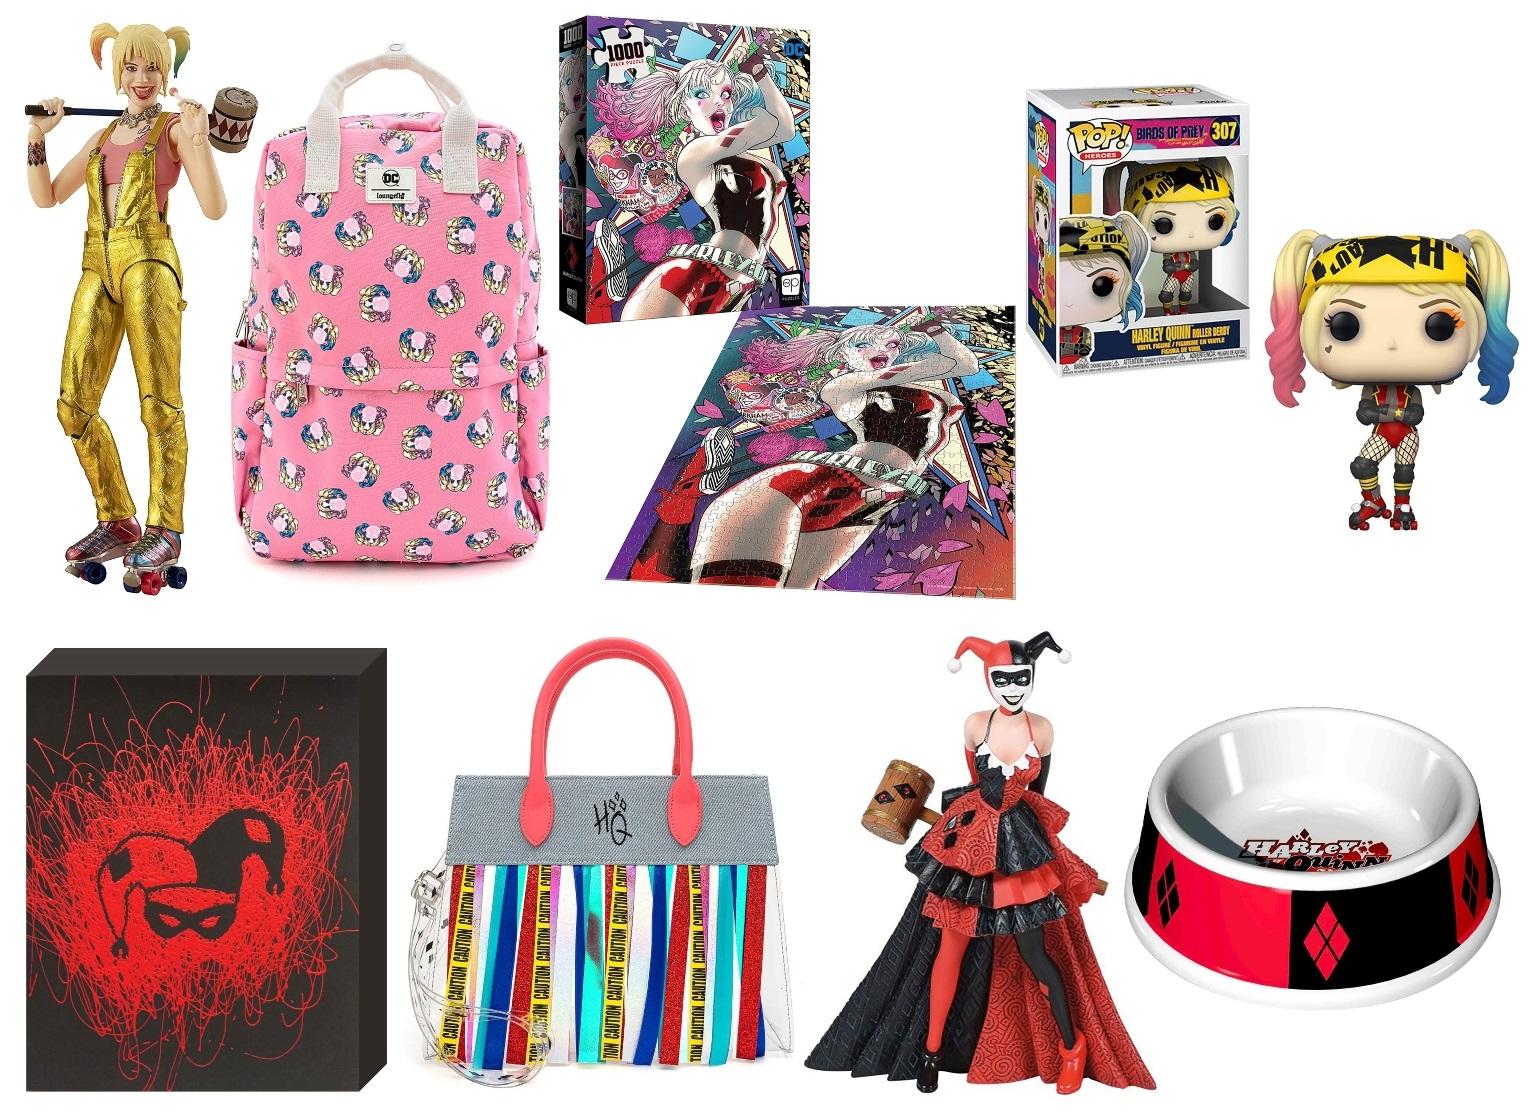 Harley Quinn Merchandise